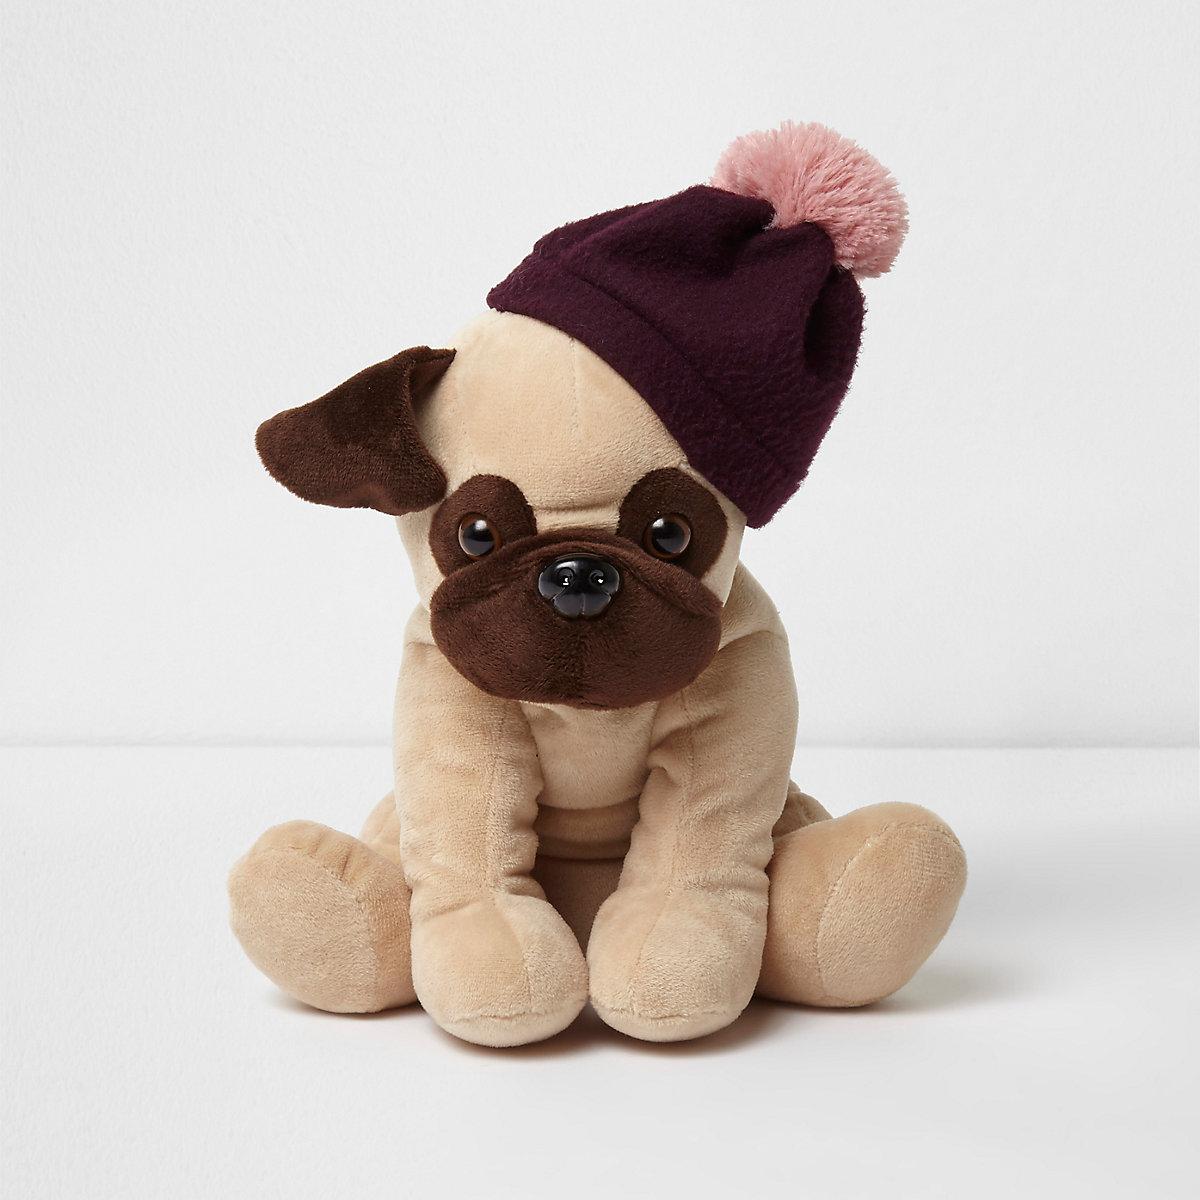 Pug dog hottie